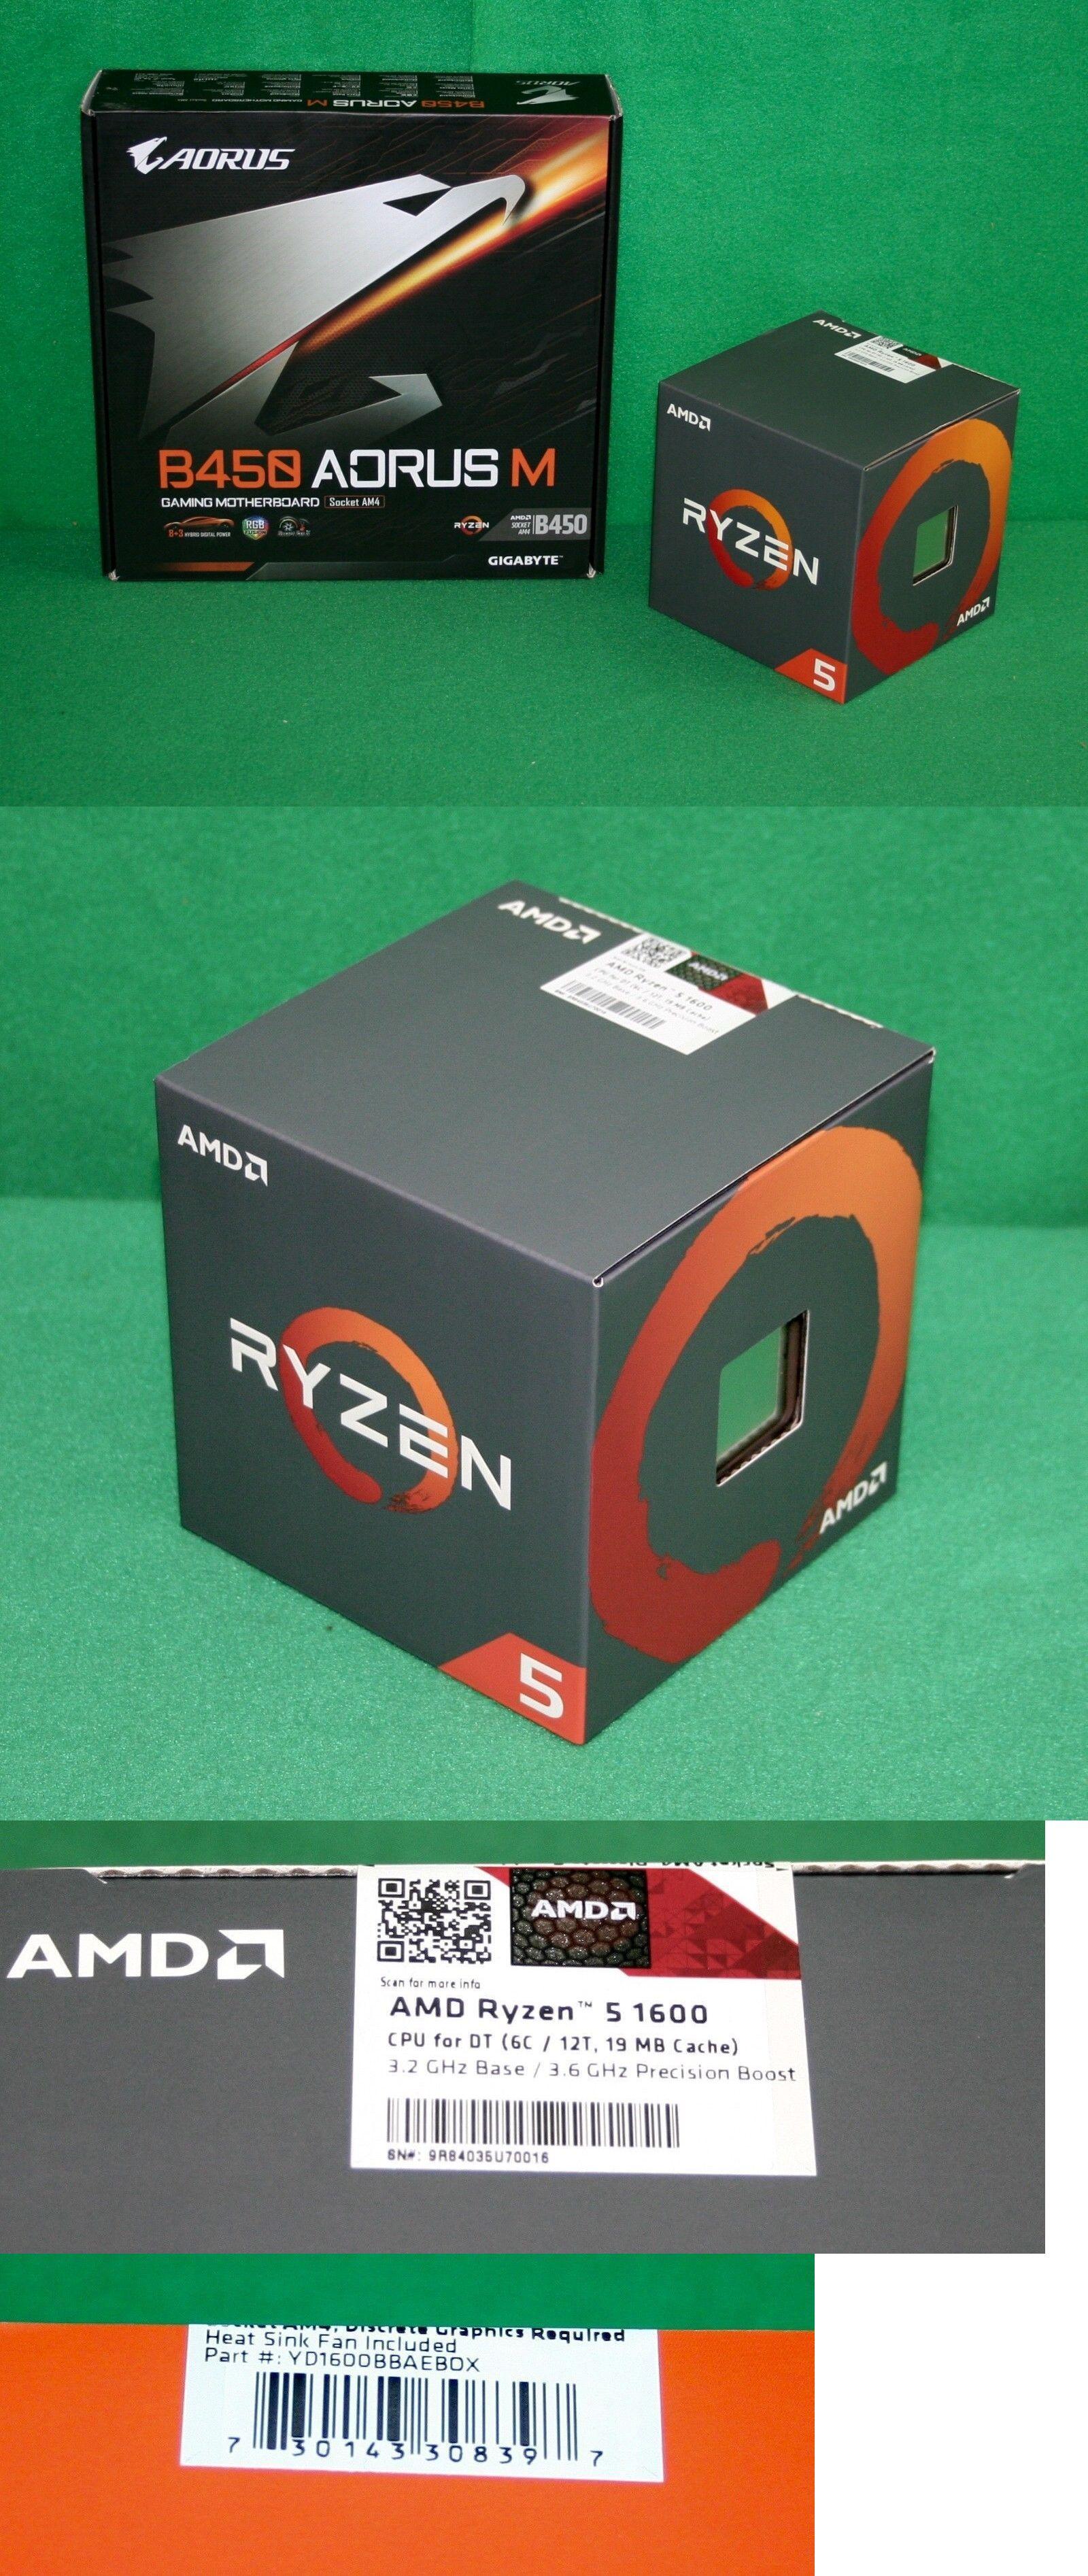 Amd Ryzen 5 1600 Ryzen Processor Gigabyte B450 Aorus M Matx Motherboard Combo Gigabyte Motherboard Amd